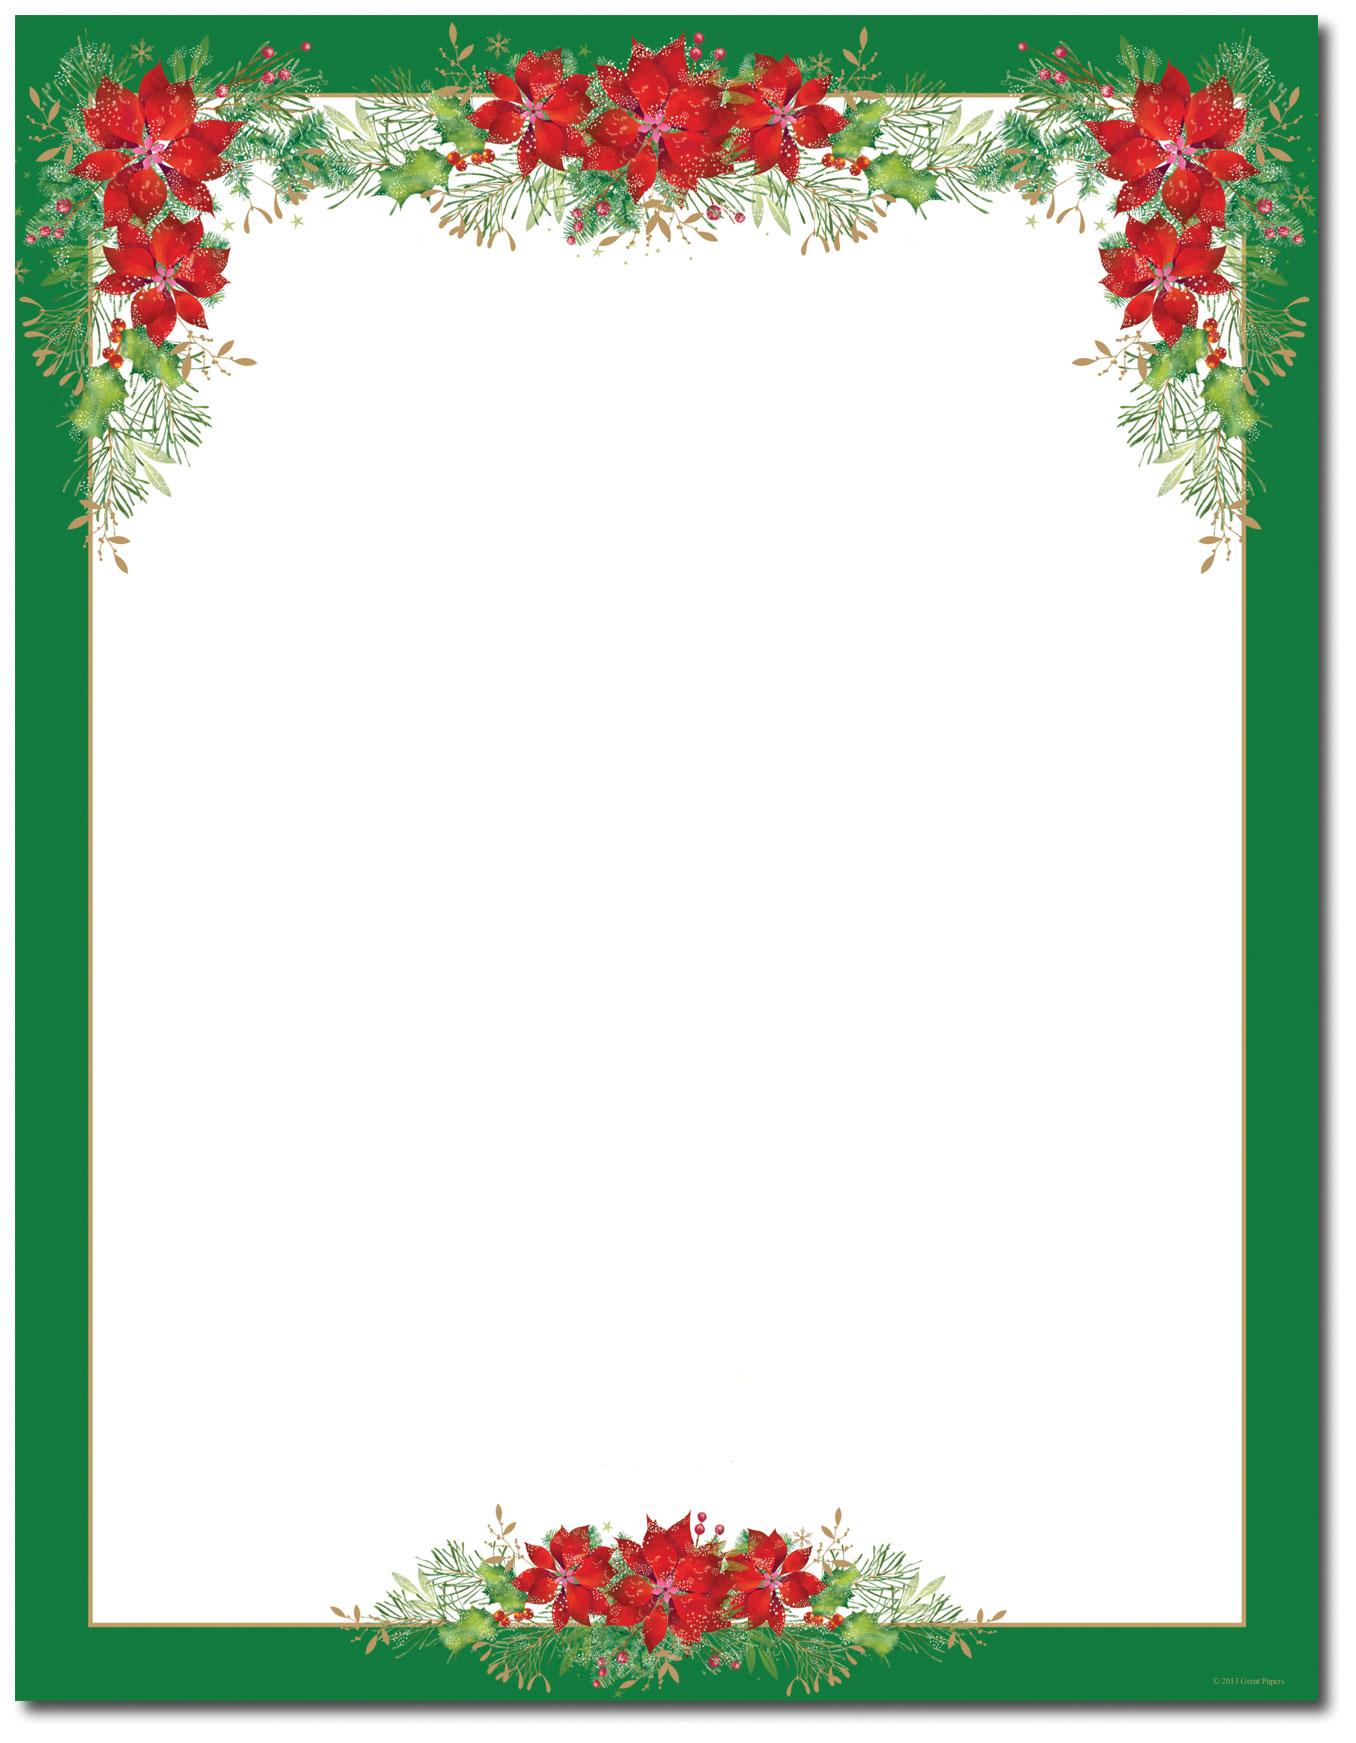 Poinsettia clipart printable Free Clipart Download Poinsettia Poinsettia